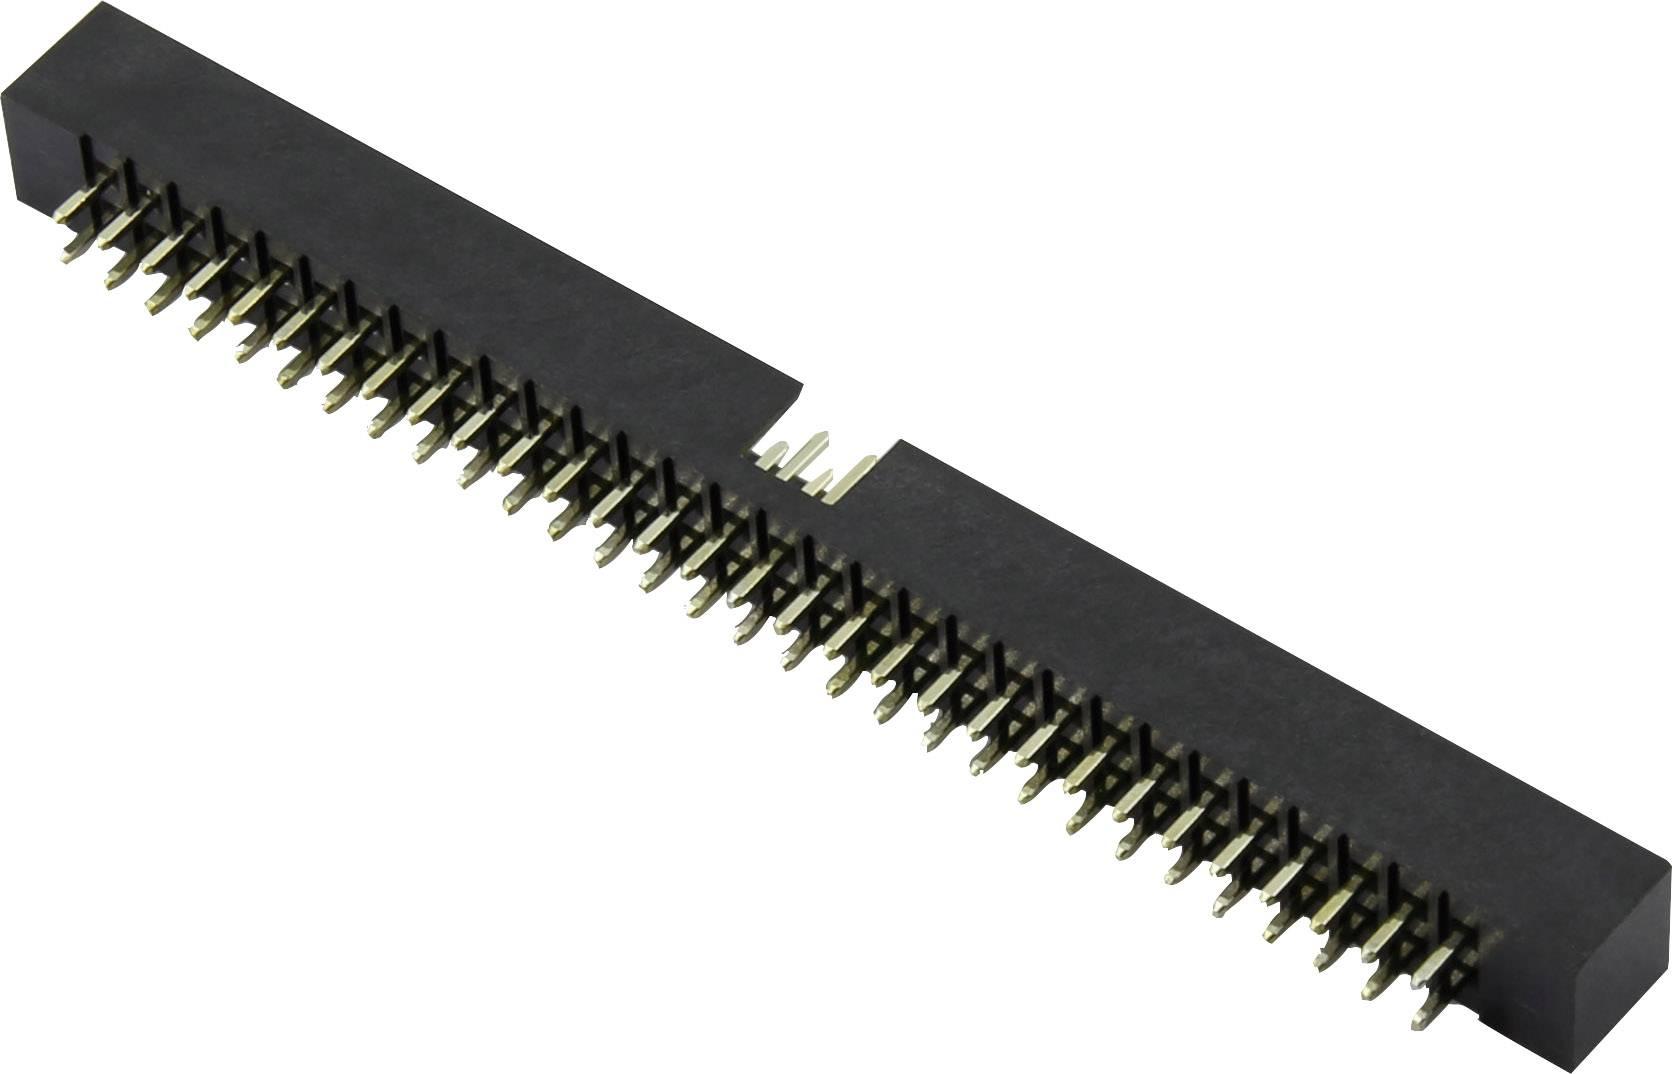 Konektor pro ploché kabely Connfly DS1014-12SF1B, rastr (rozteč): 2 mm, počet pólů: 12, 1 ks